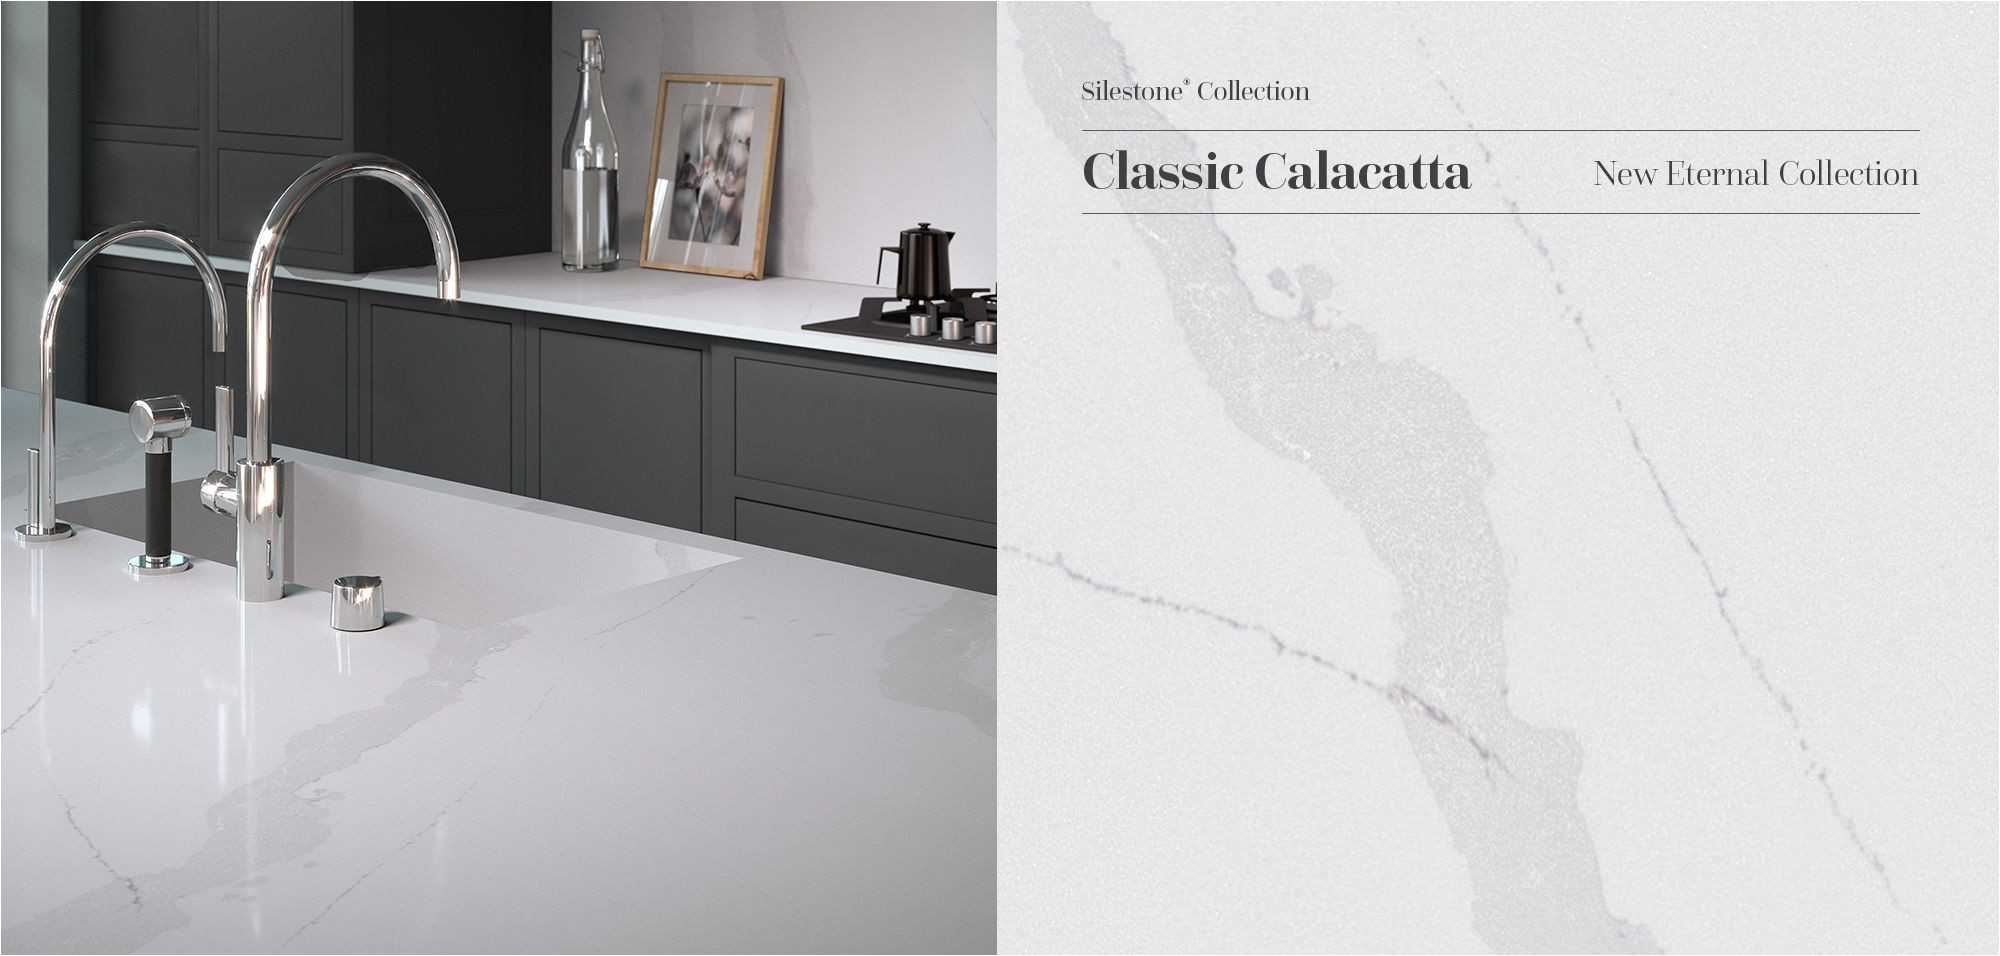 elegant and subtle silestone classic calacatta reinterprets coveted calacatta marble its uniform grayish veins stretch across the slab with a translucent